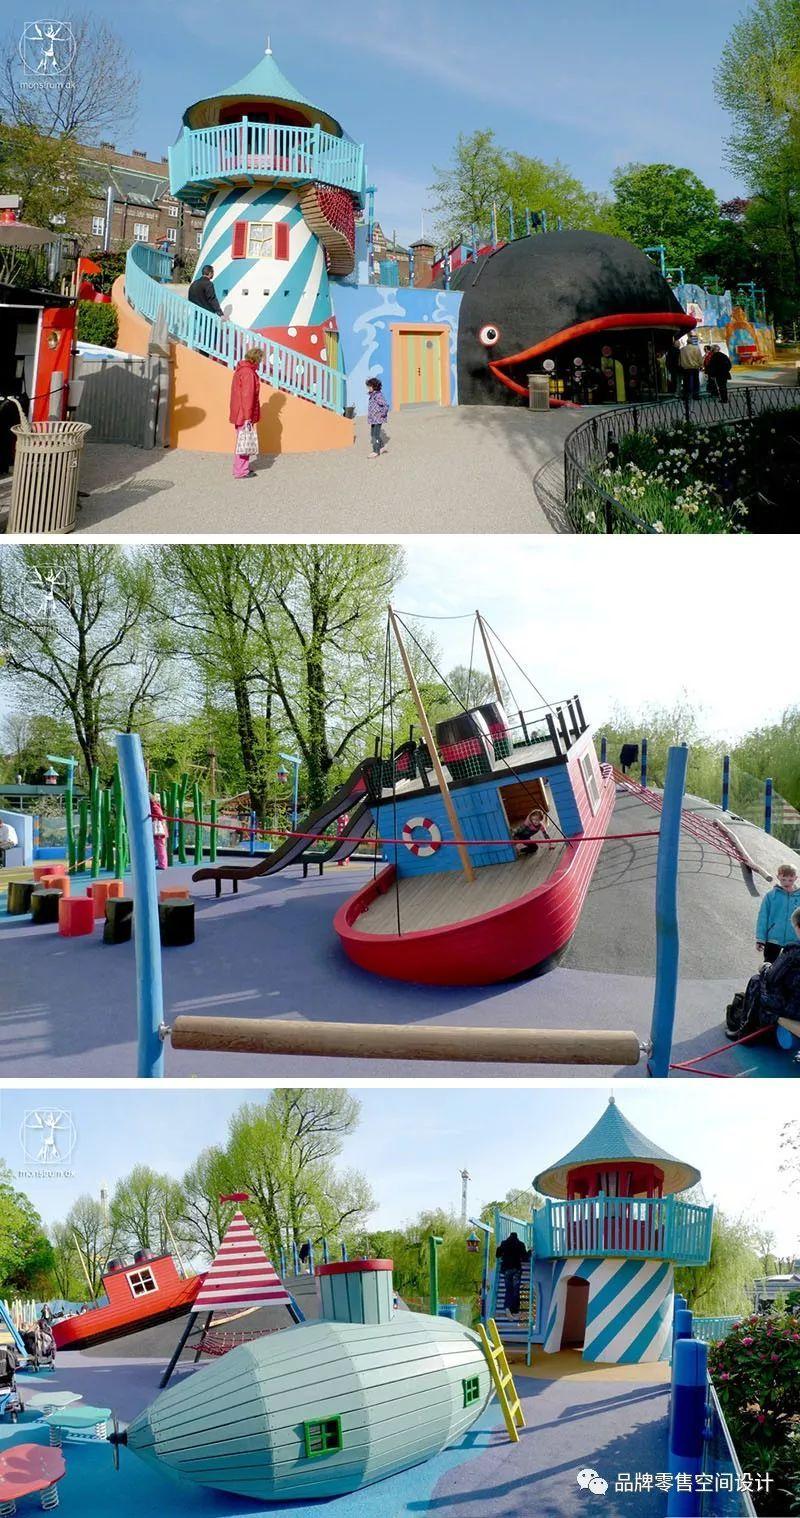 monstrum设计的疯狂儿童游乐场图片